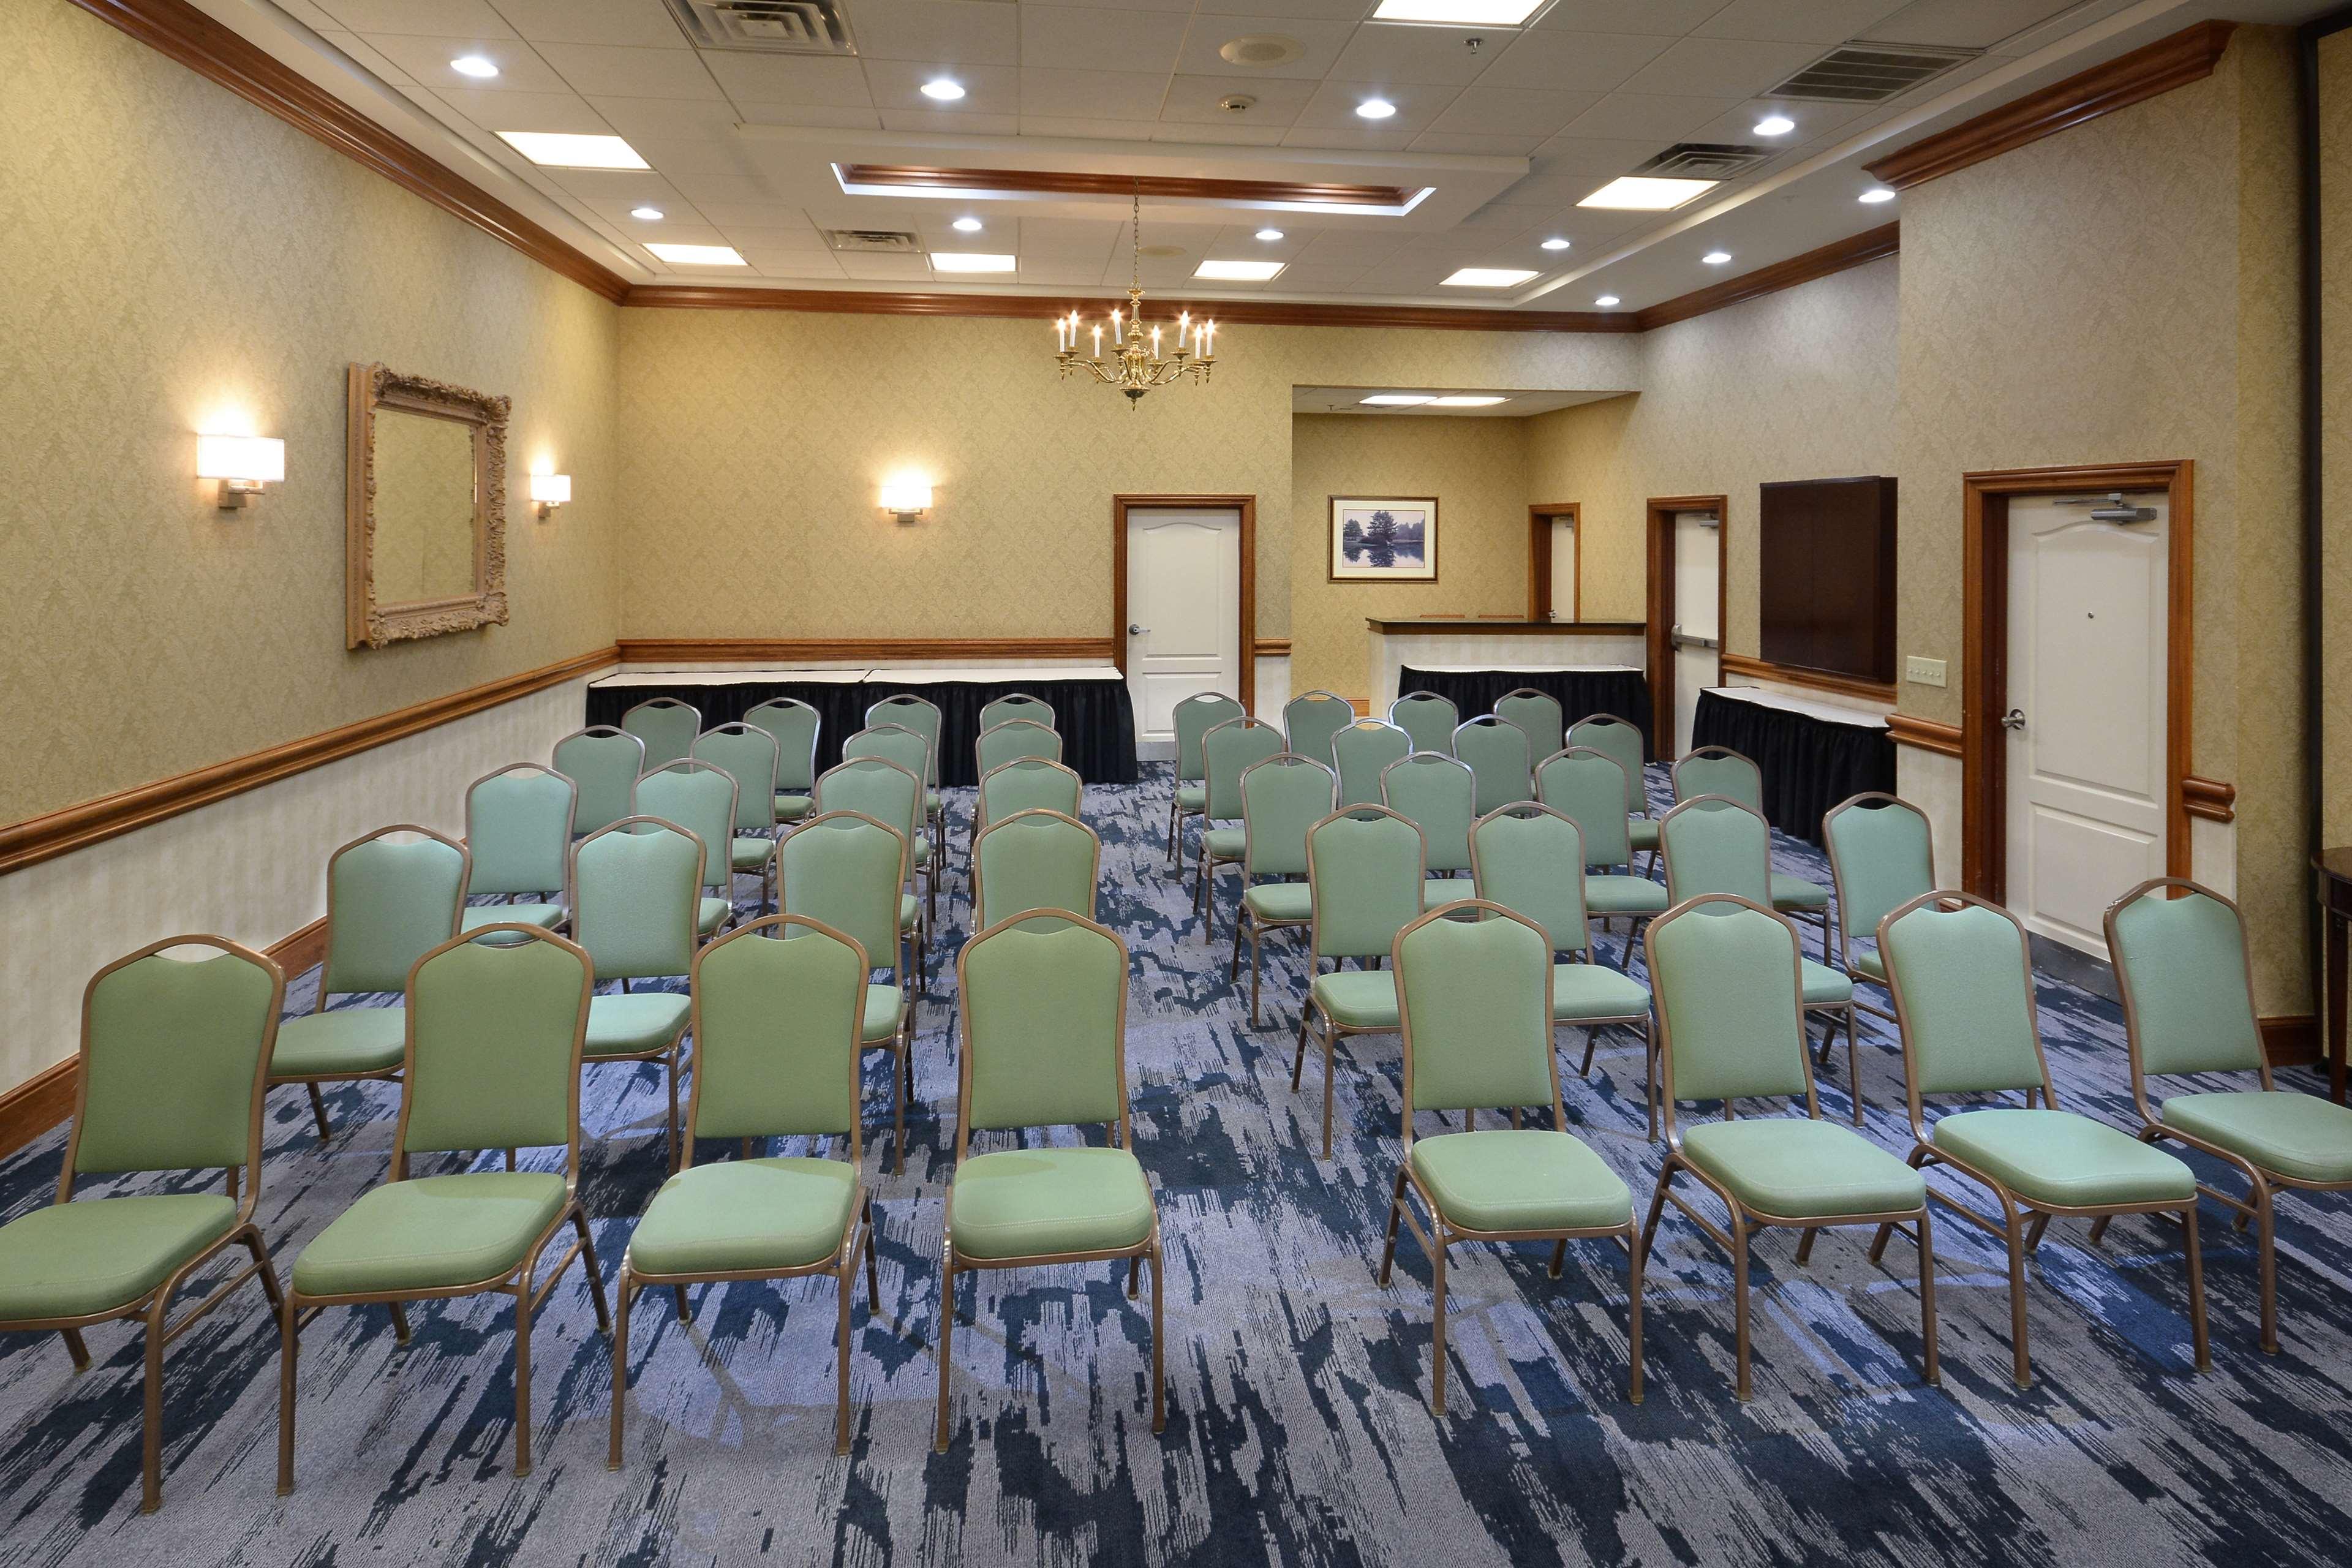 Hampton Inn & Suites Greenville/Spartanburg I-85 image 46